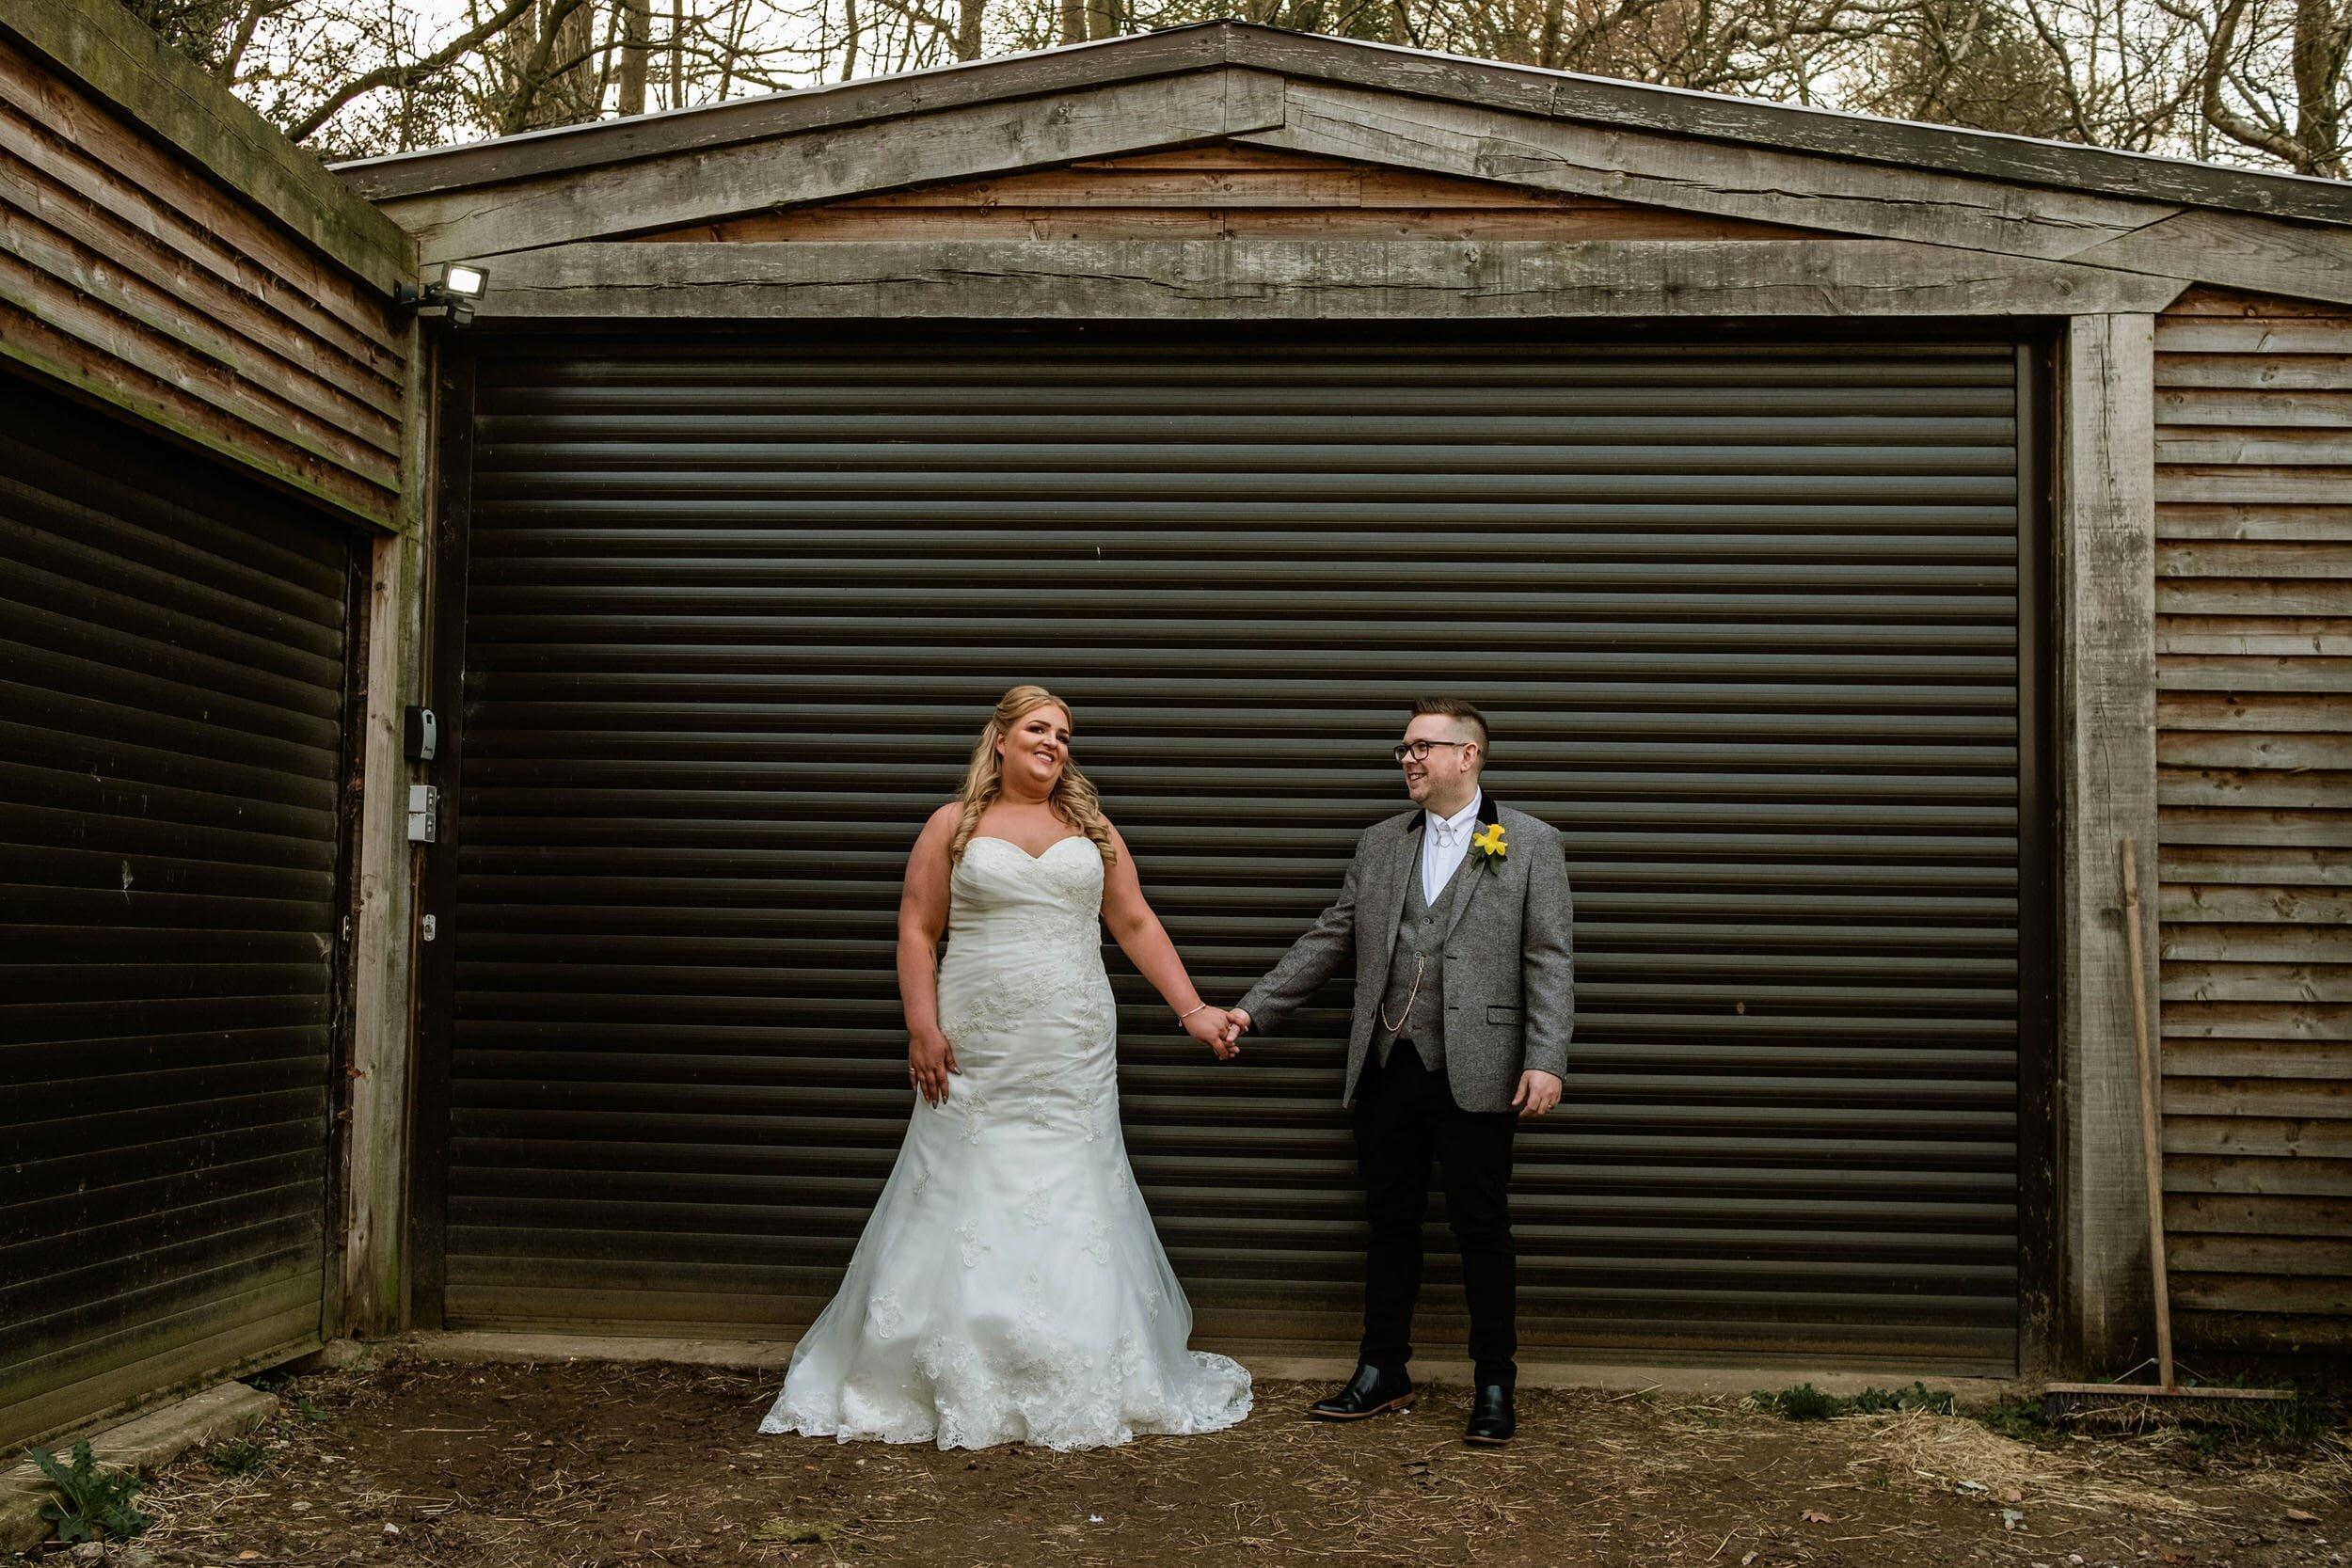 The Ashes Barns Wedding Photographer00174.jpg